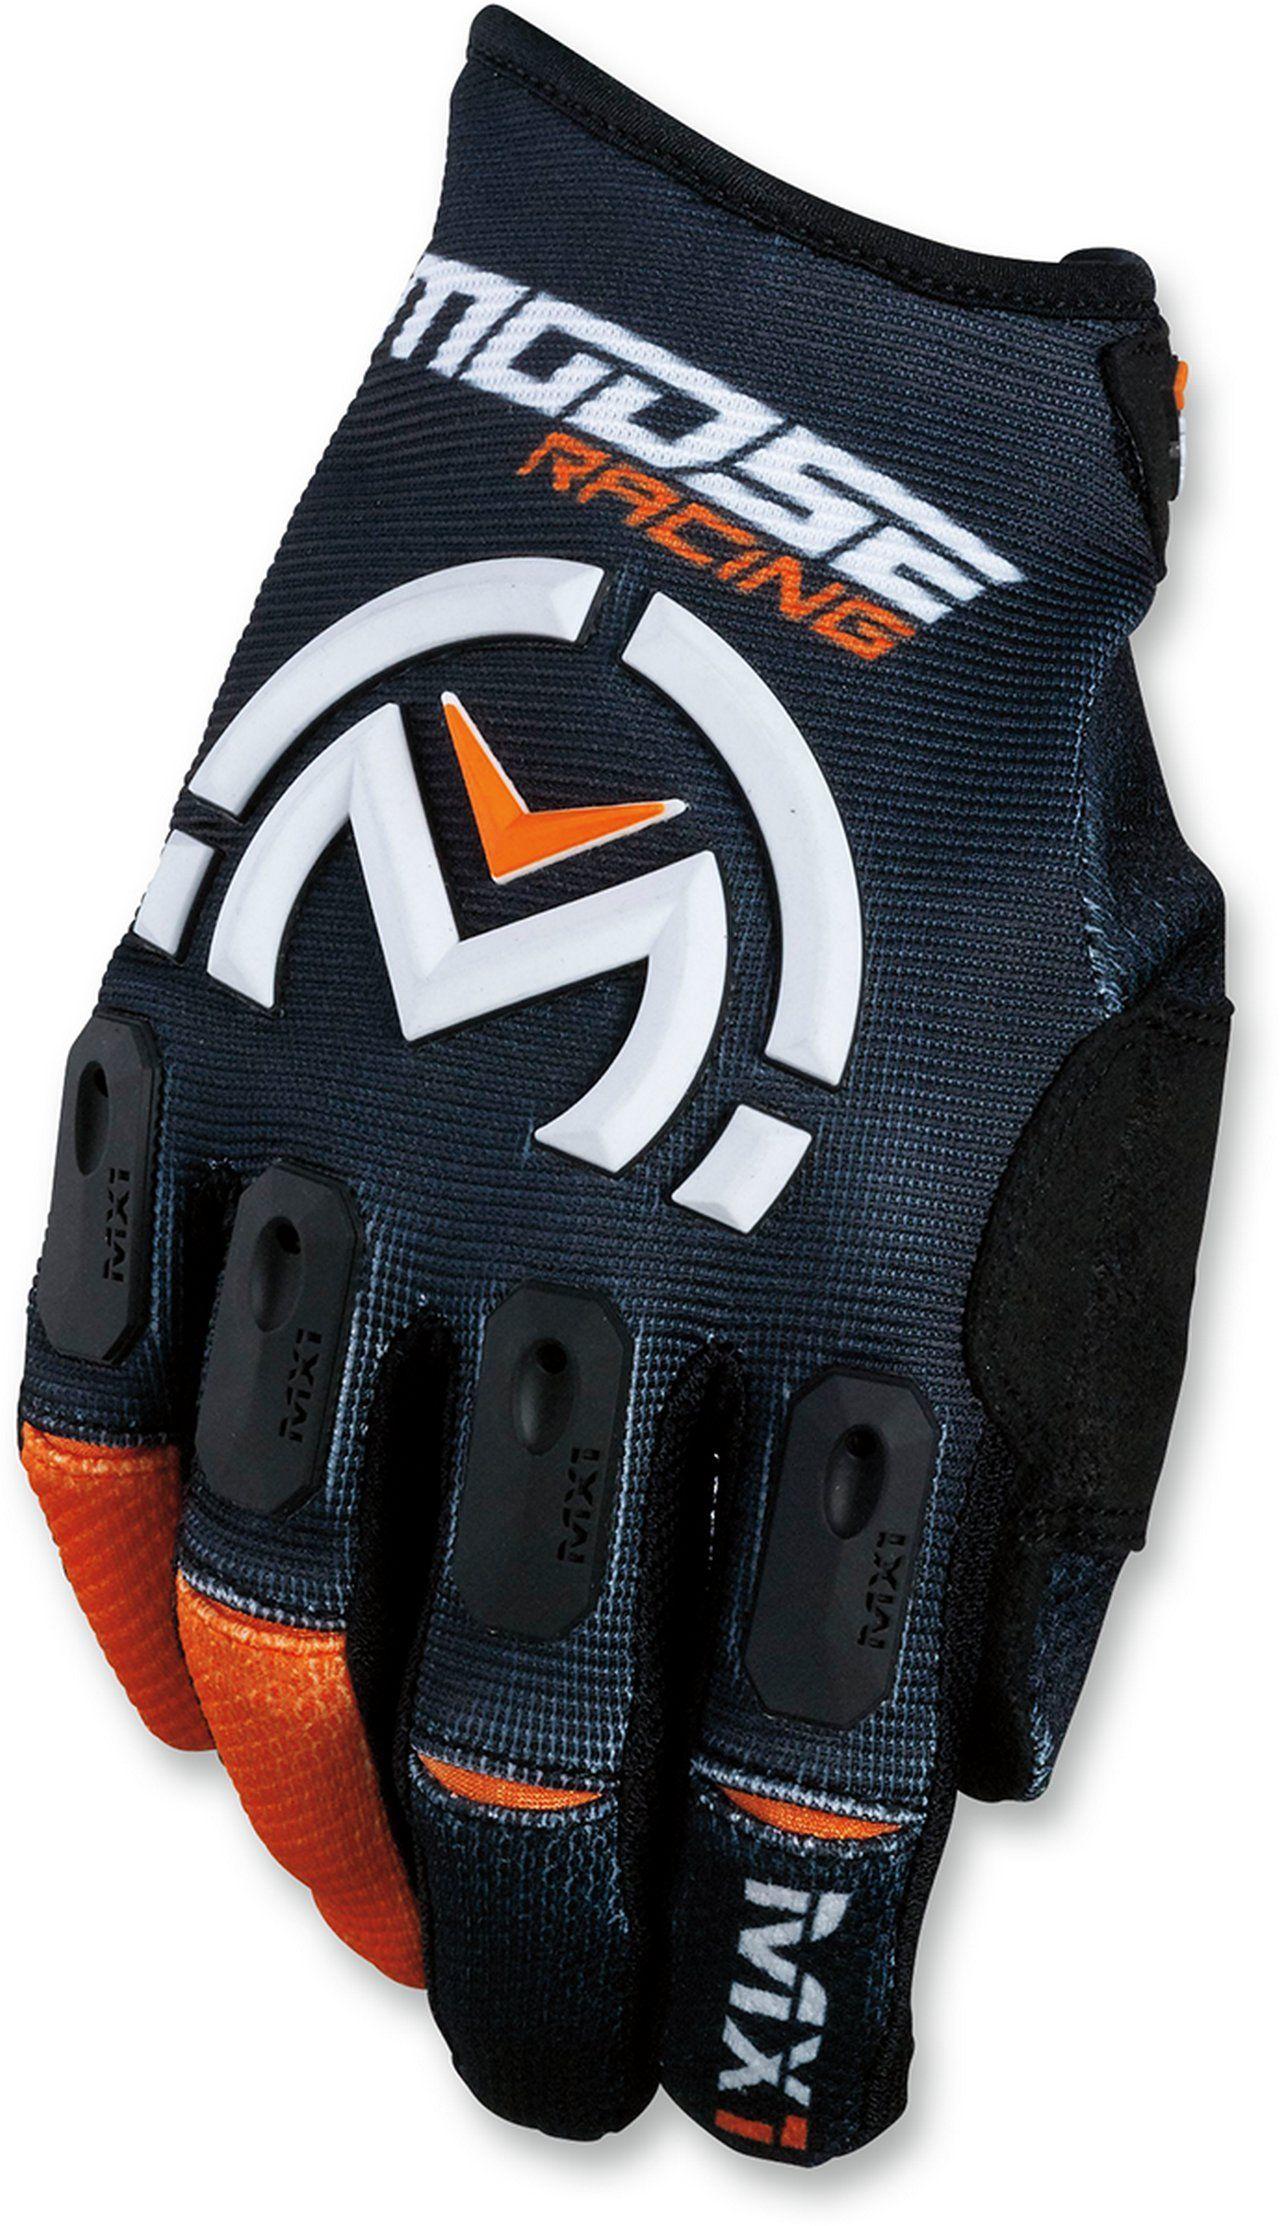 【MOOSE RACING】MX1 手套 [3330-4494] - 「Webike-摩托百貨」